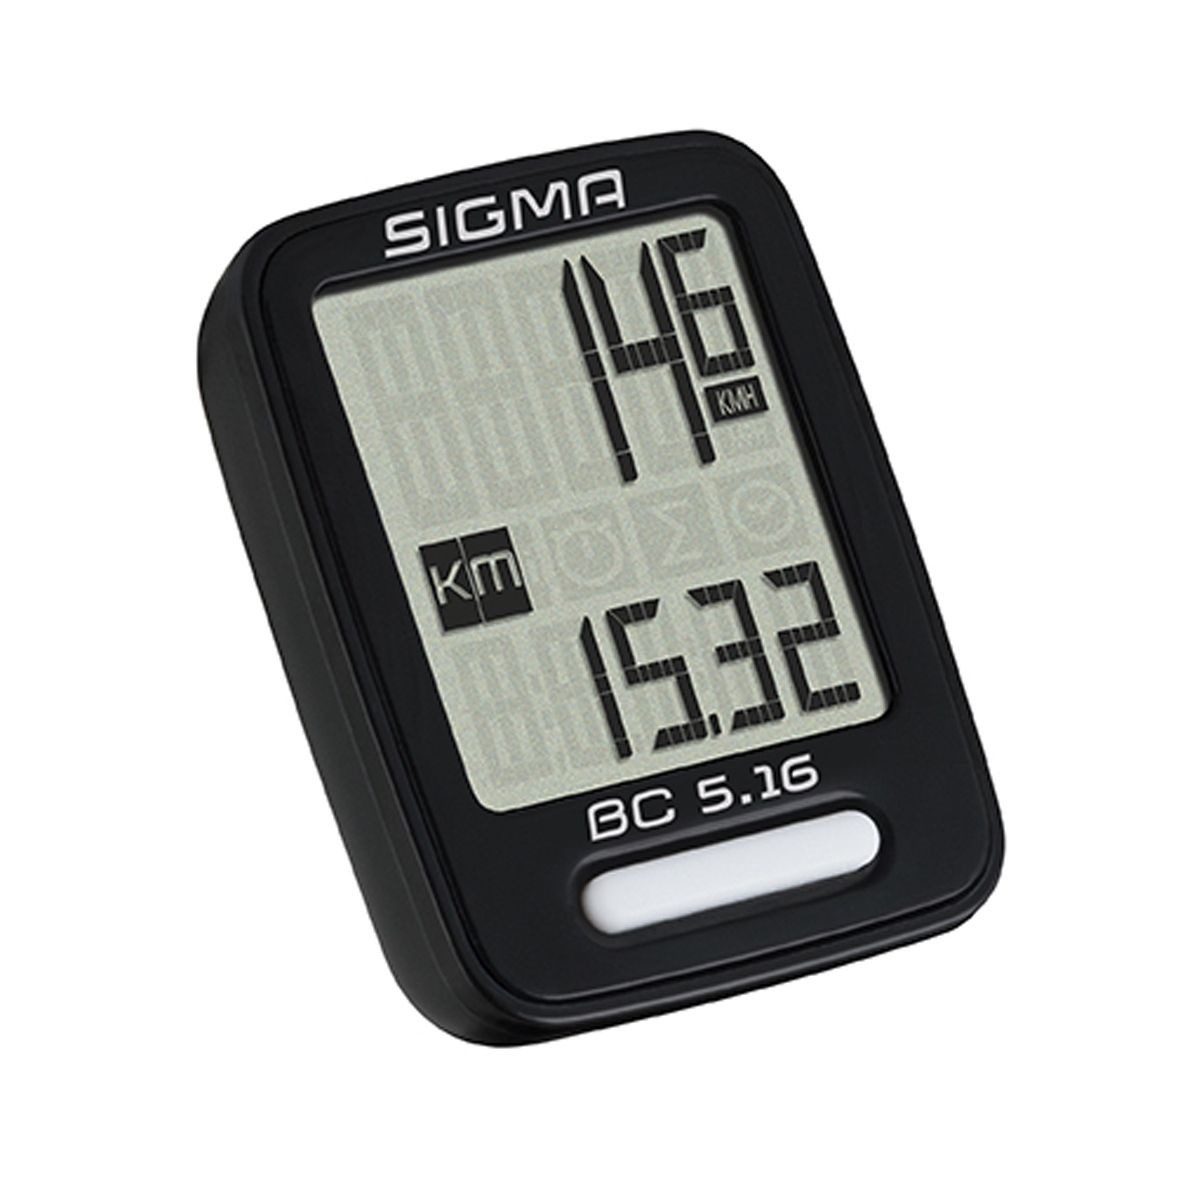 Tachometr počítač SIGMA BC 5.16 NEW